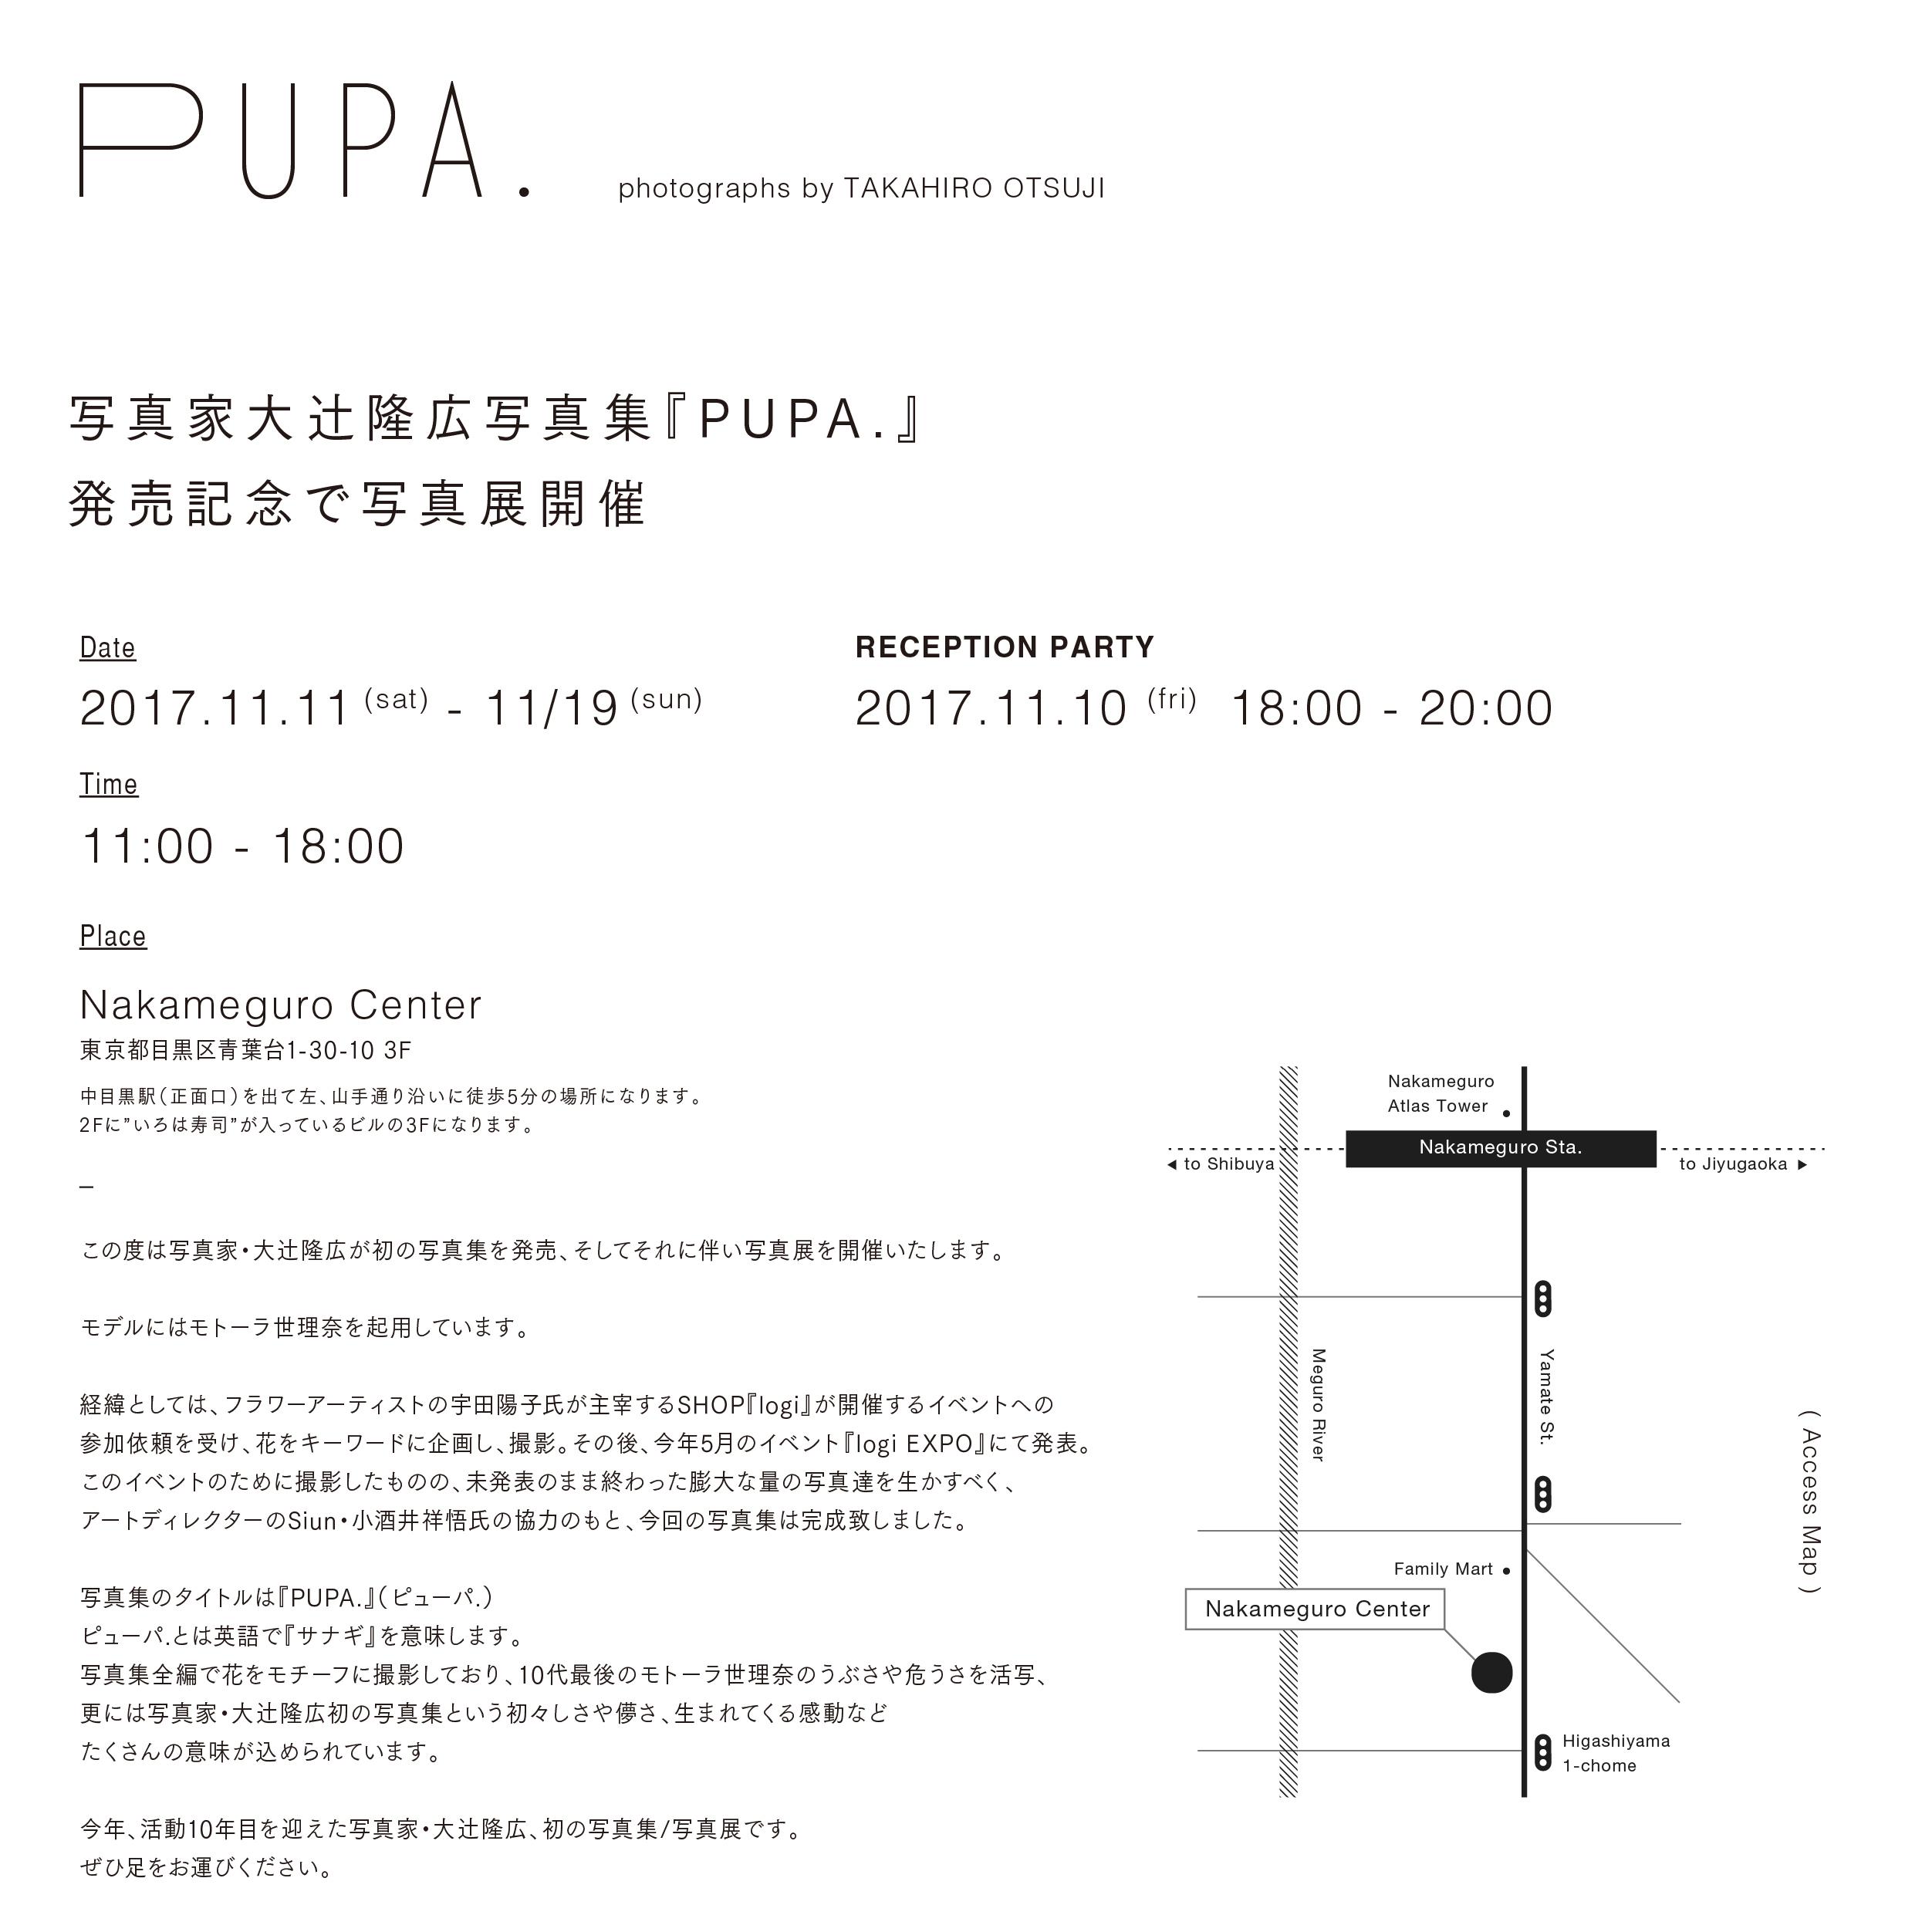 pupa_dm1026